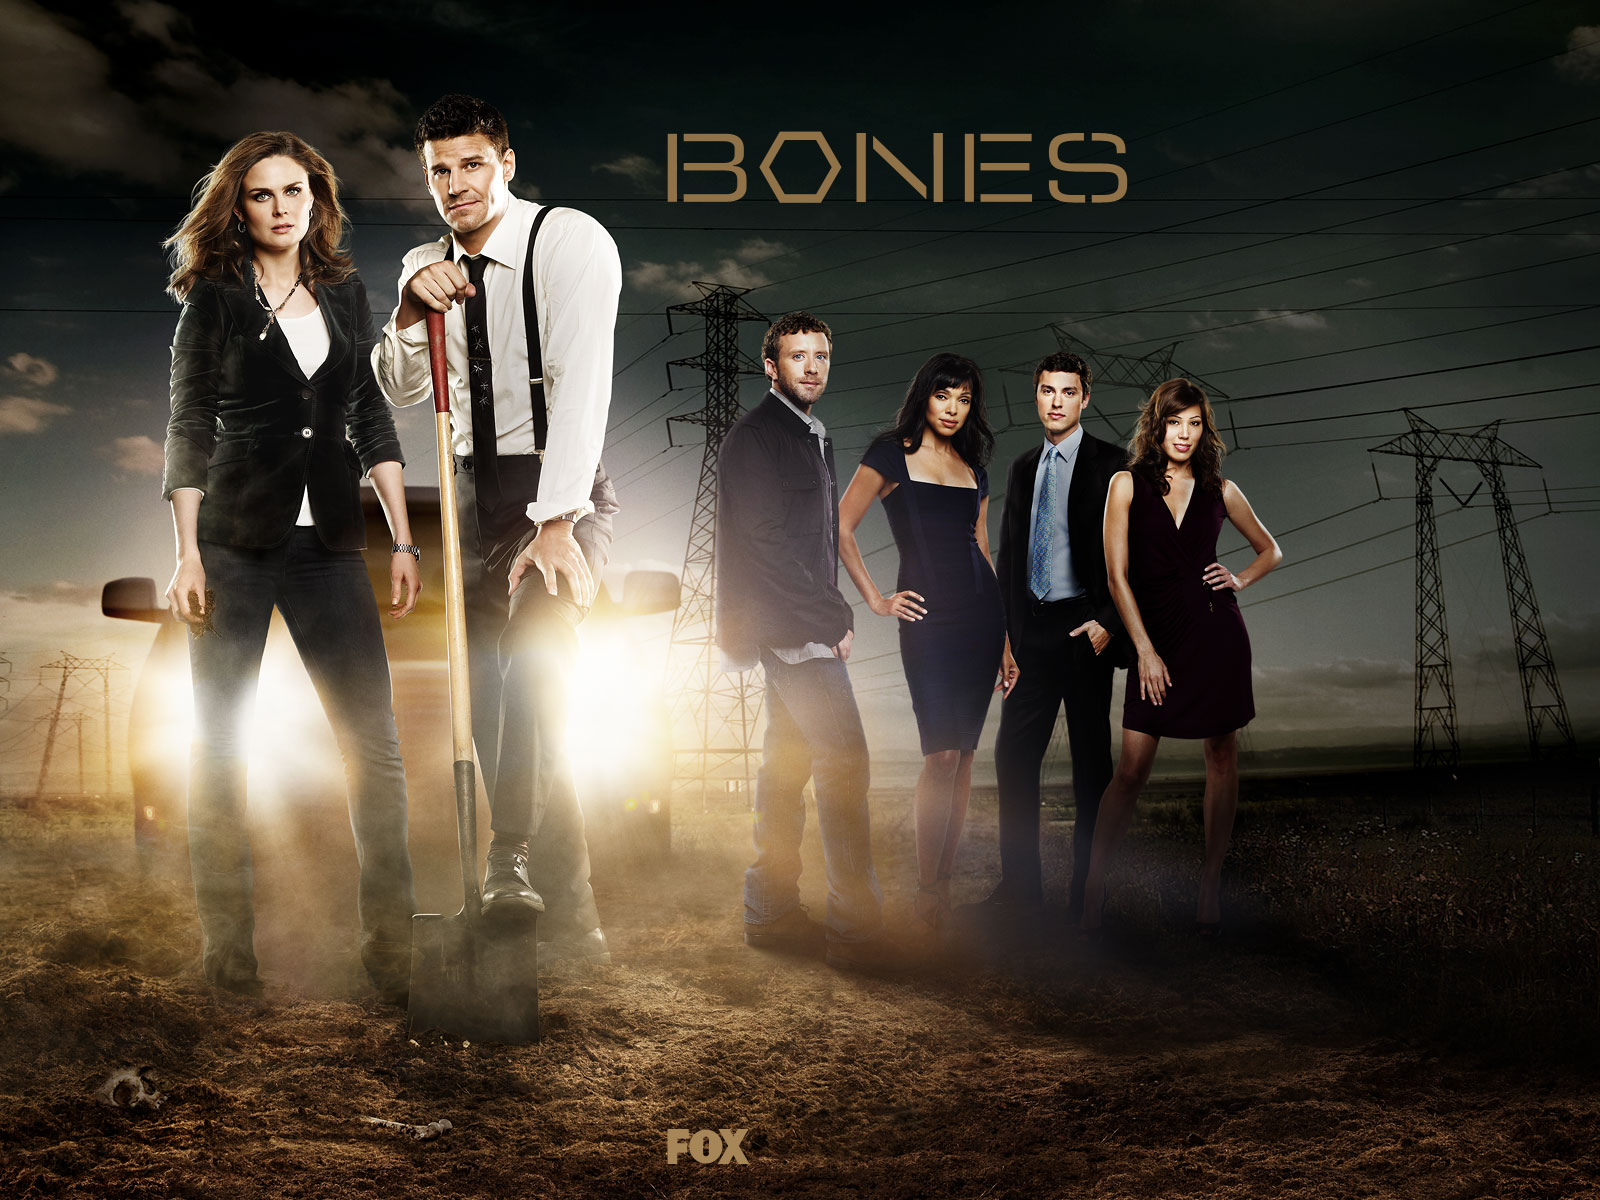 Bones Wallpaper And Background Image